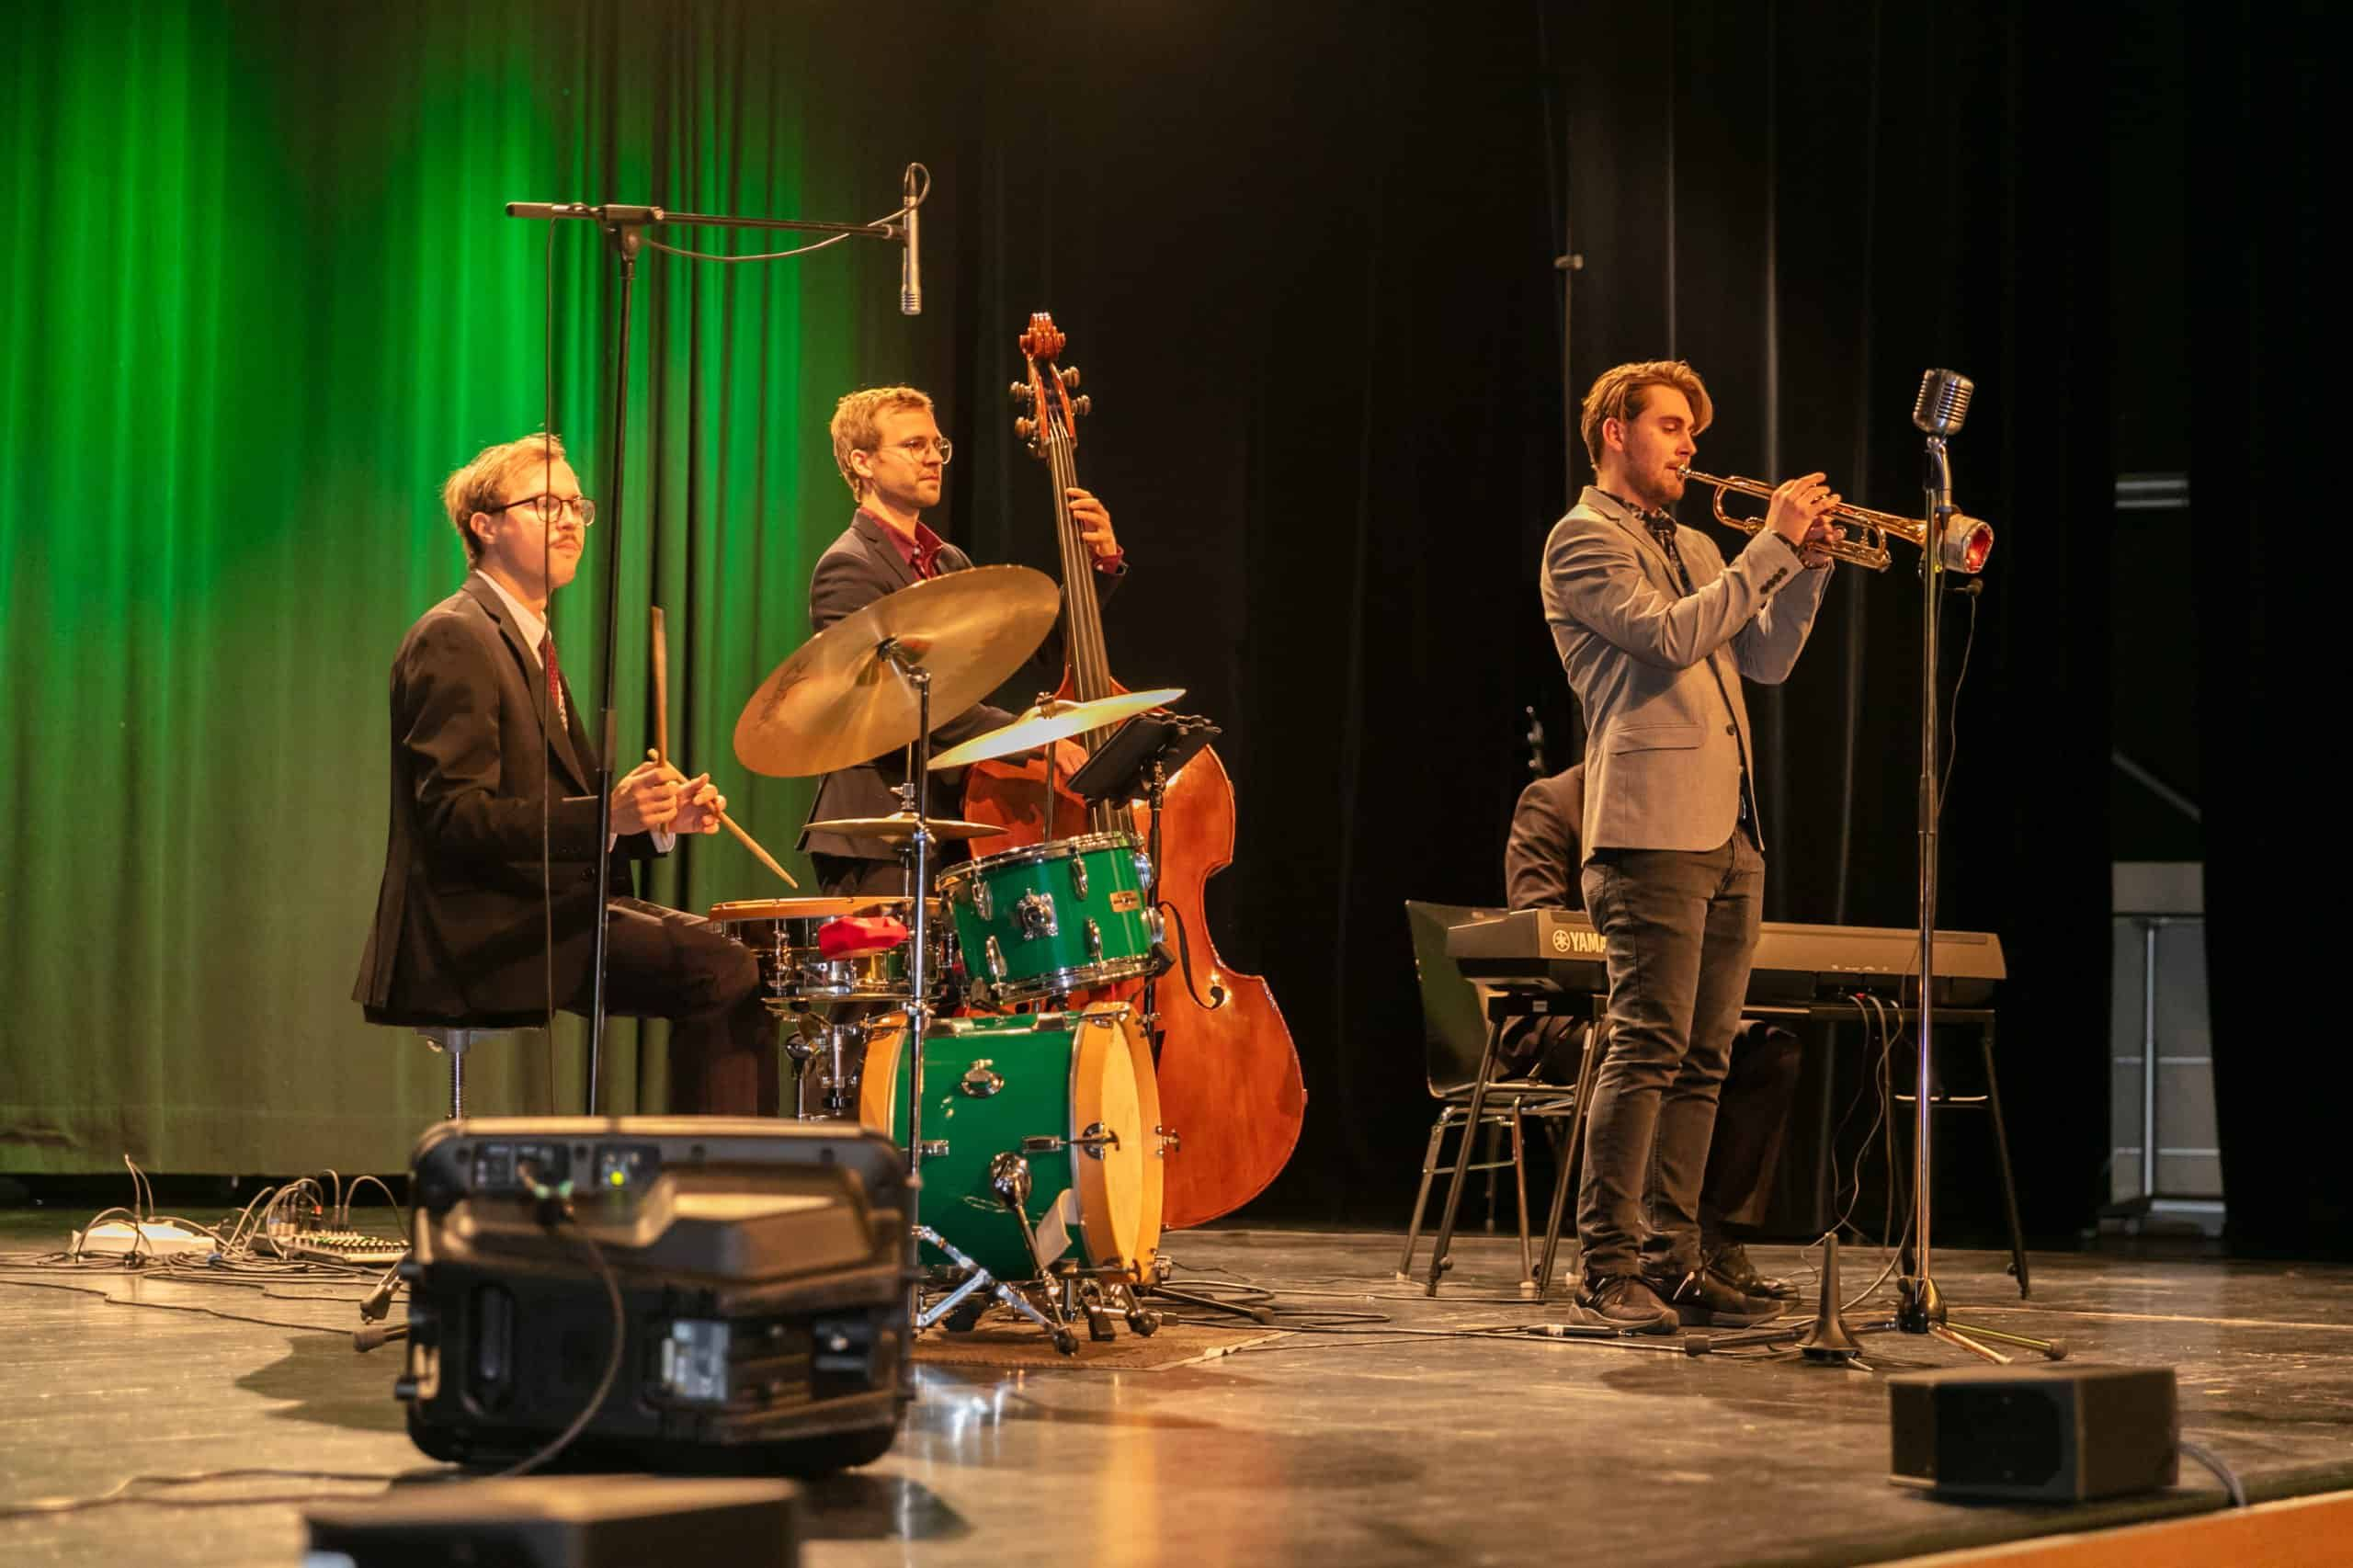 Live Band Fur Firmenfeiern Events In At Jazz Band Aus Der Steiermark Live Band Jazz Livemusik